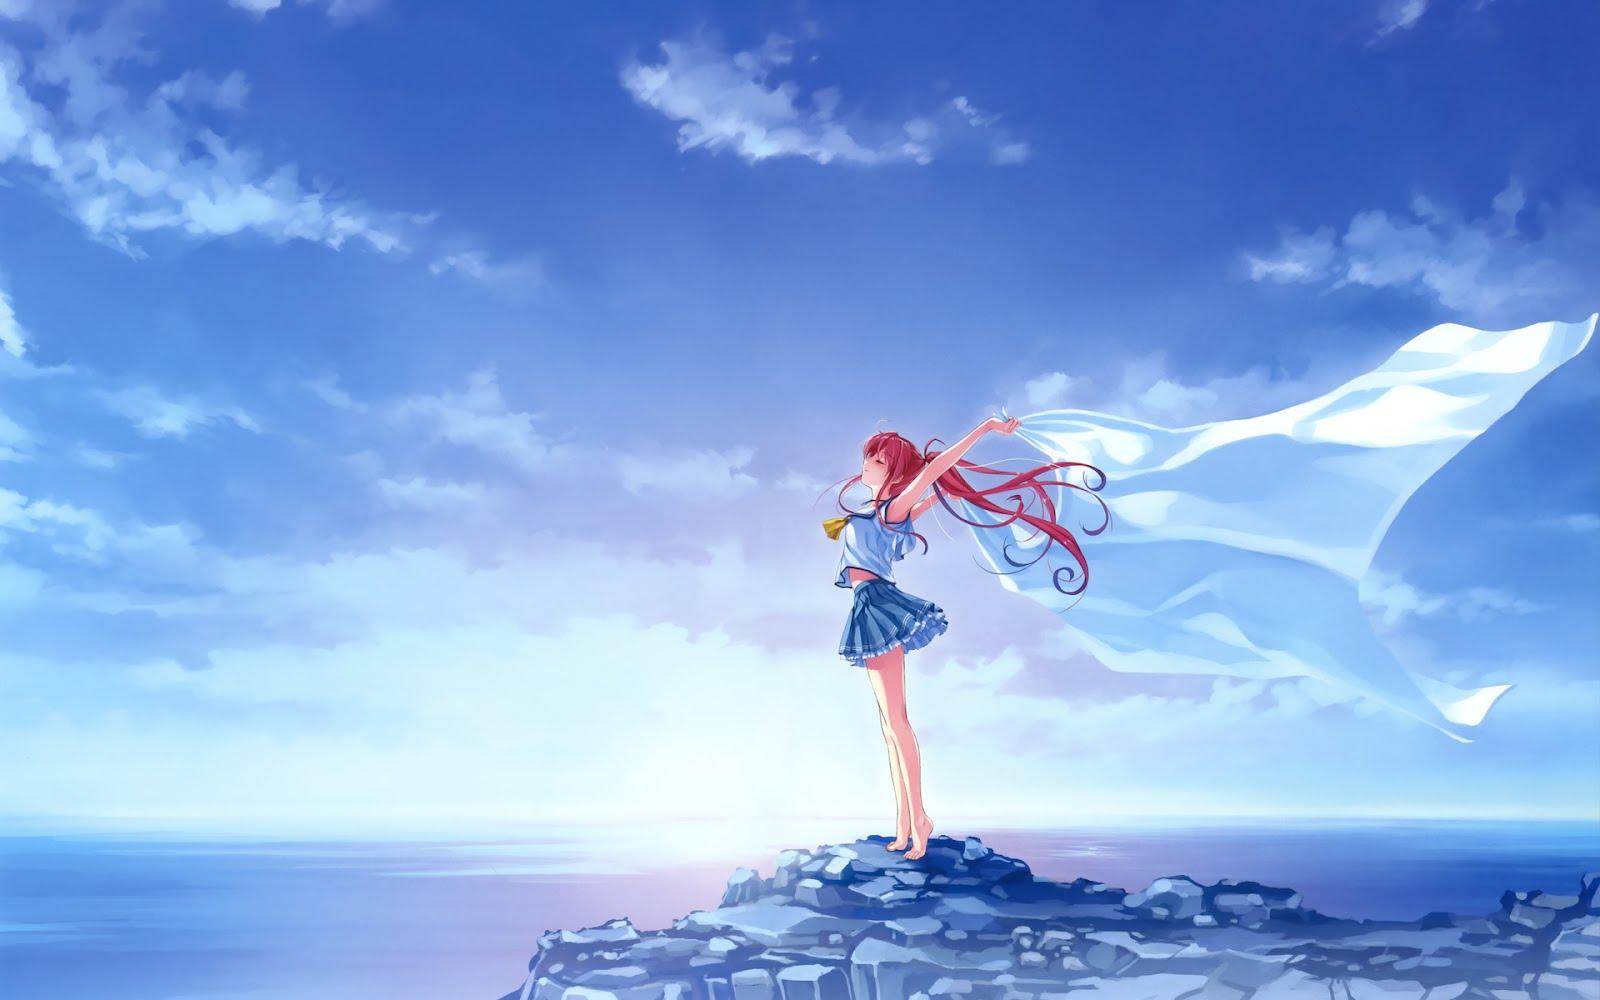 Una hermosa chica del anime (Cartoon y Manga)